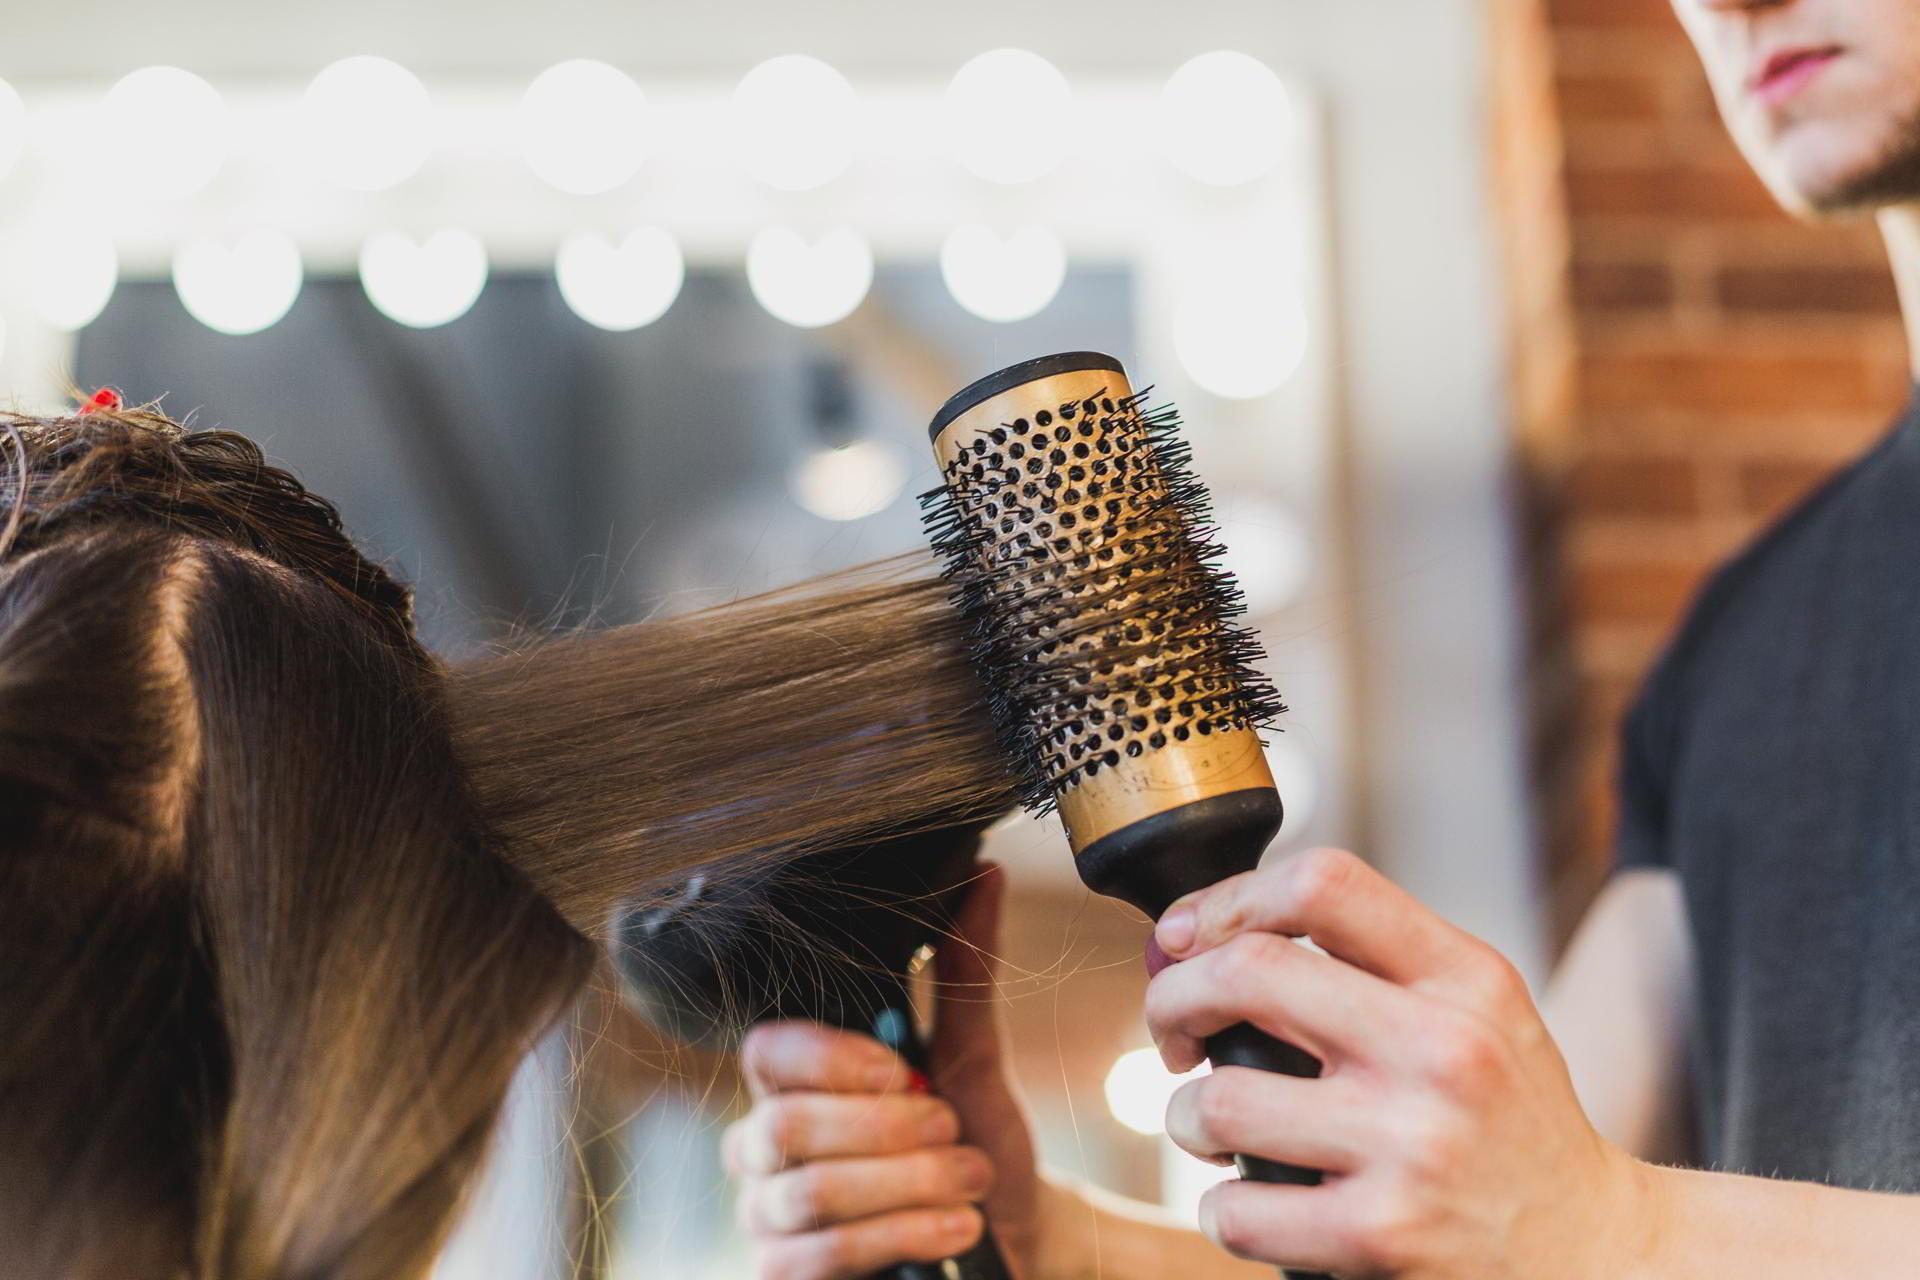 salon blow drying hair